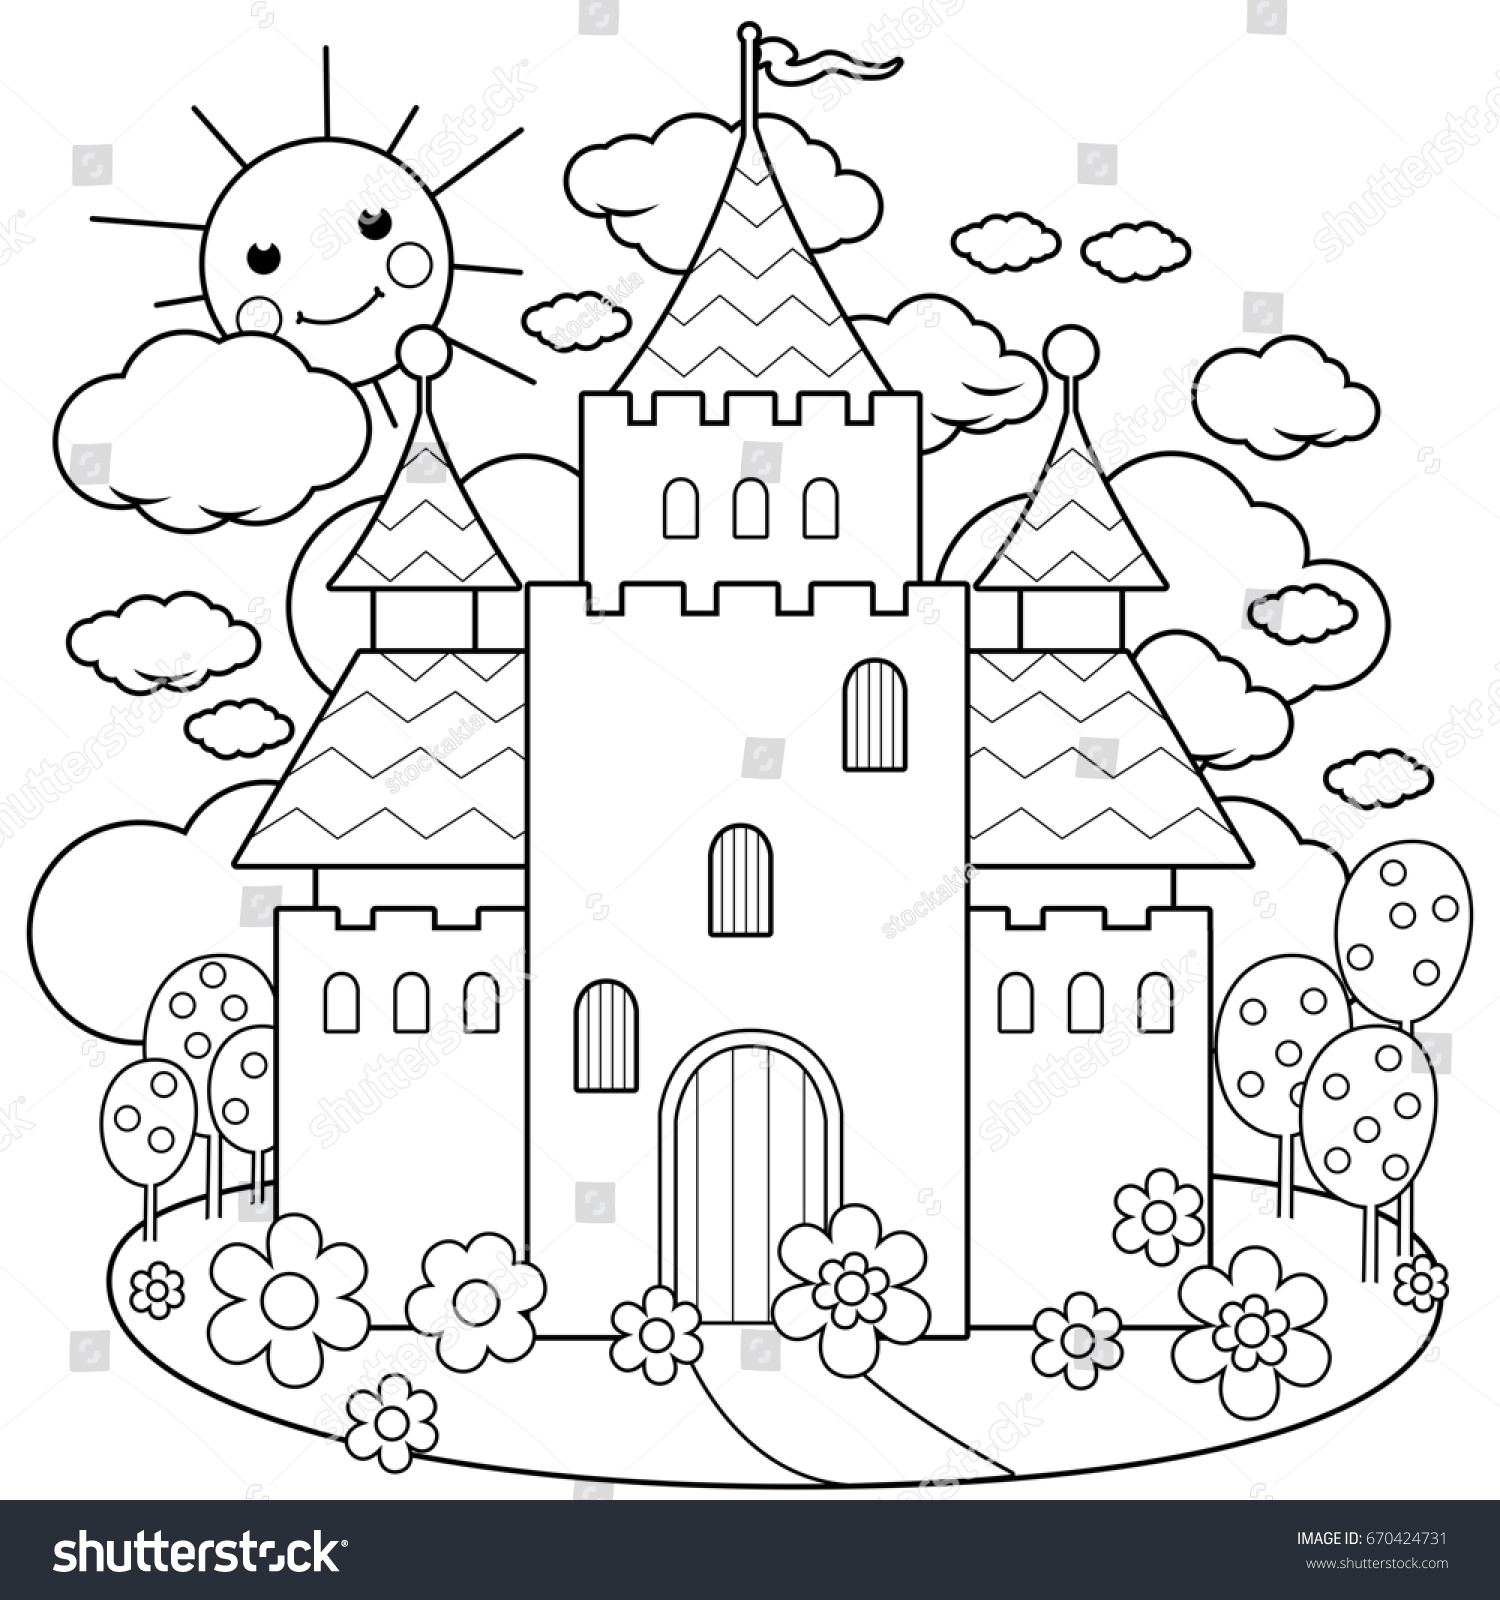 Beautiful Fairy Tale Castle Black White Stock Illustration 670424731 ...